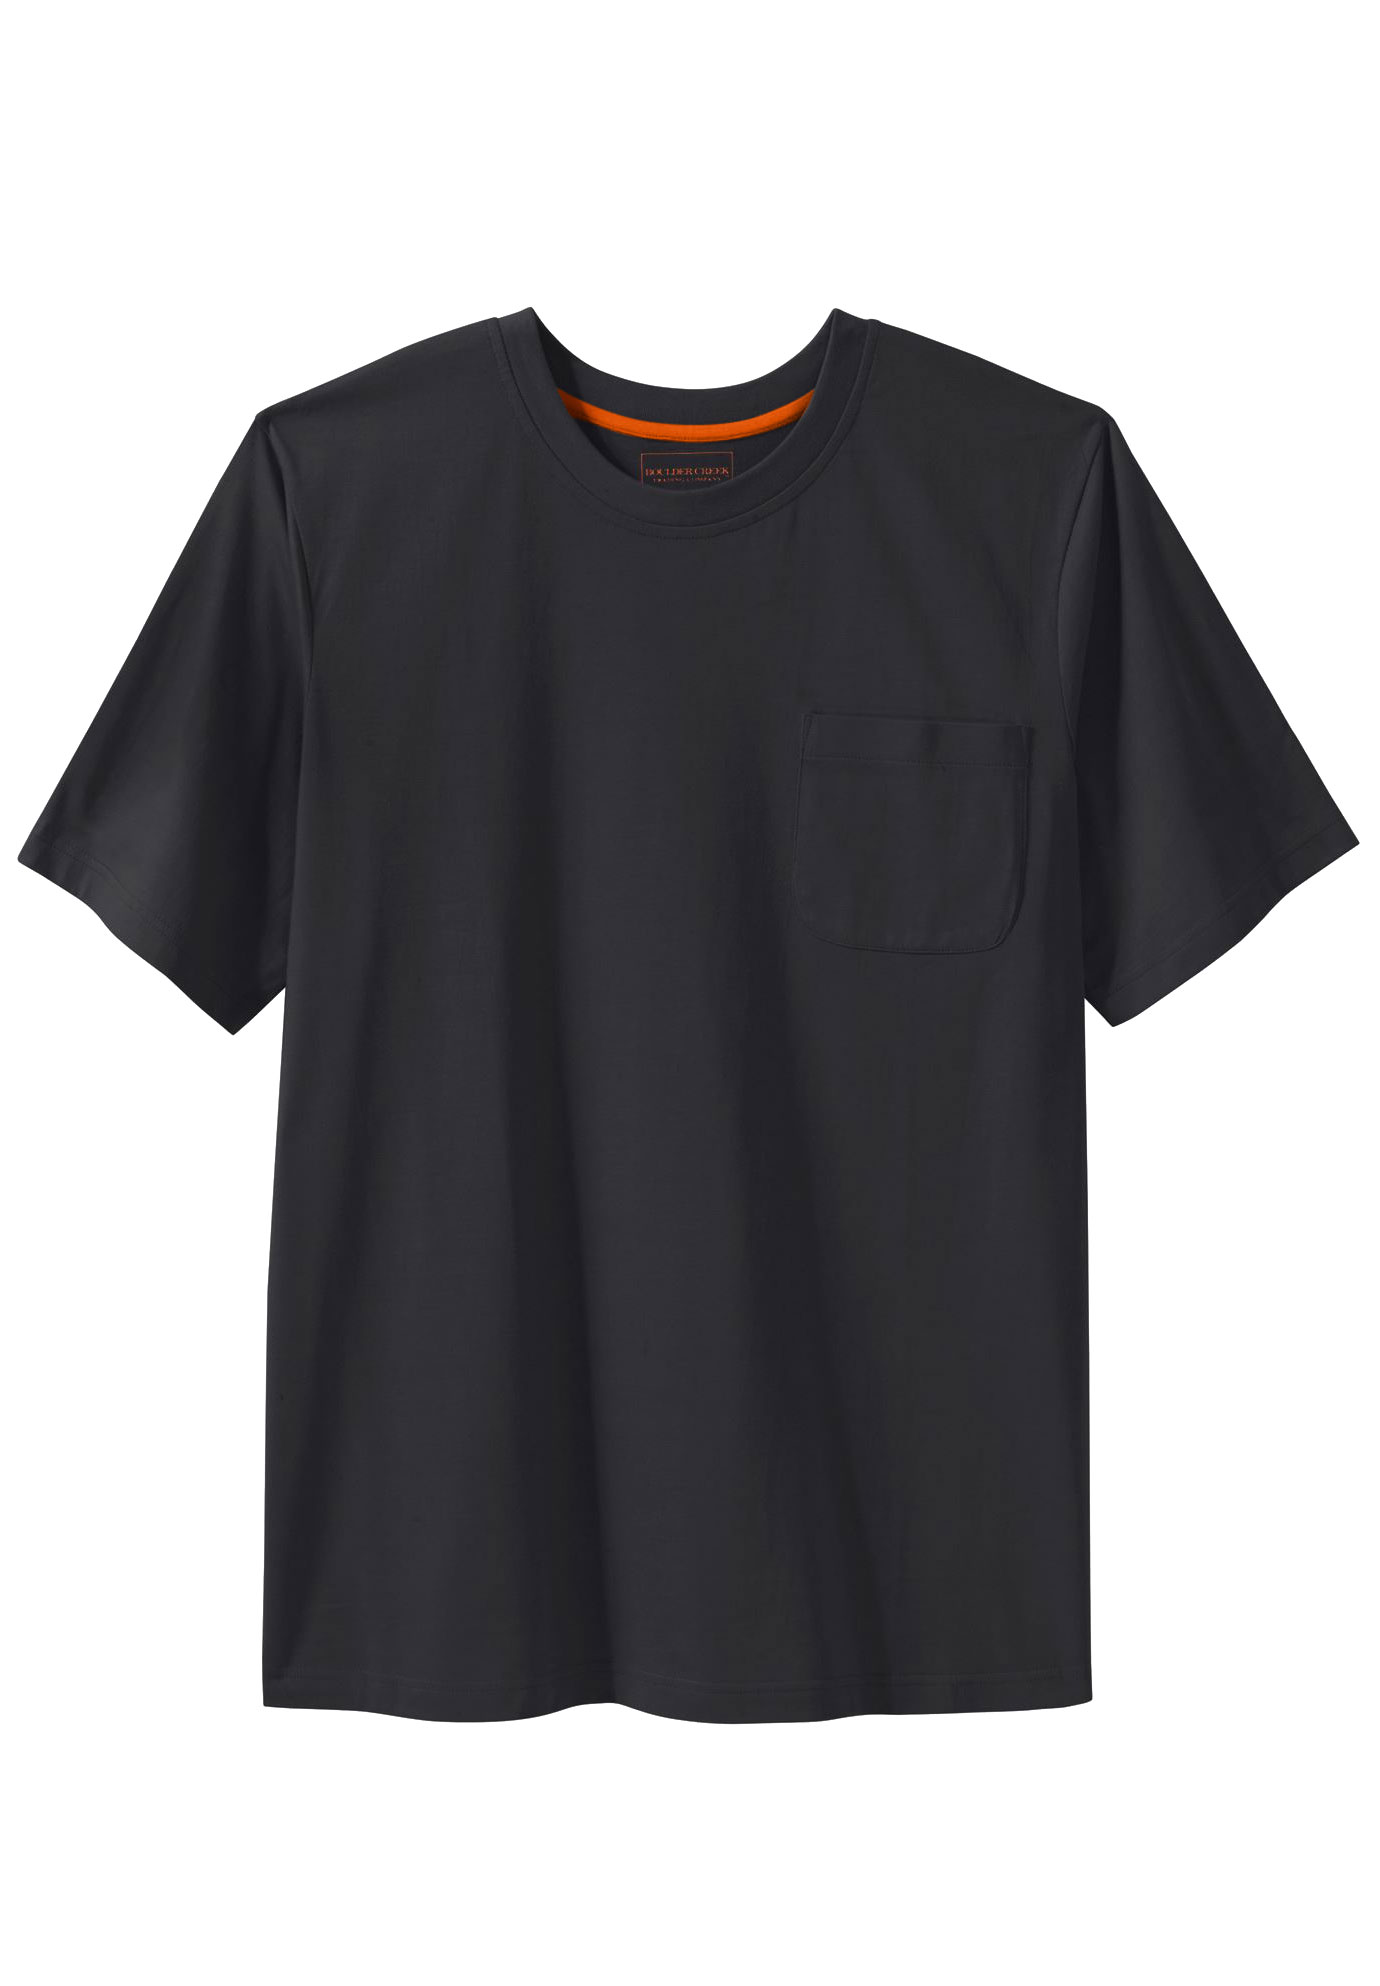 3XL White Harbor Bay by DXL Big and Tall Shapewear Tank T-Shirt